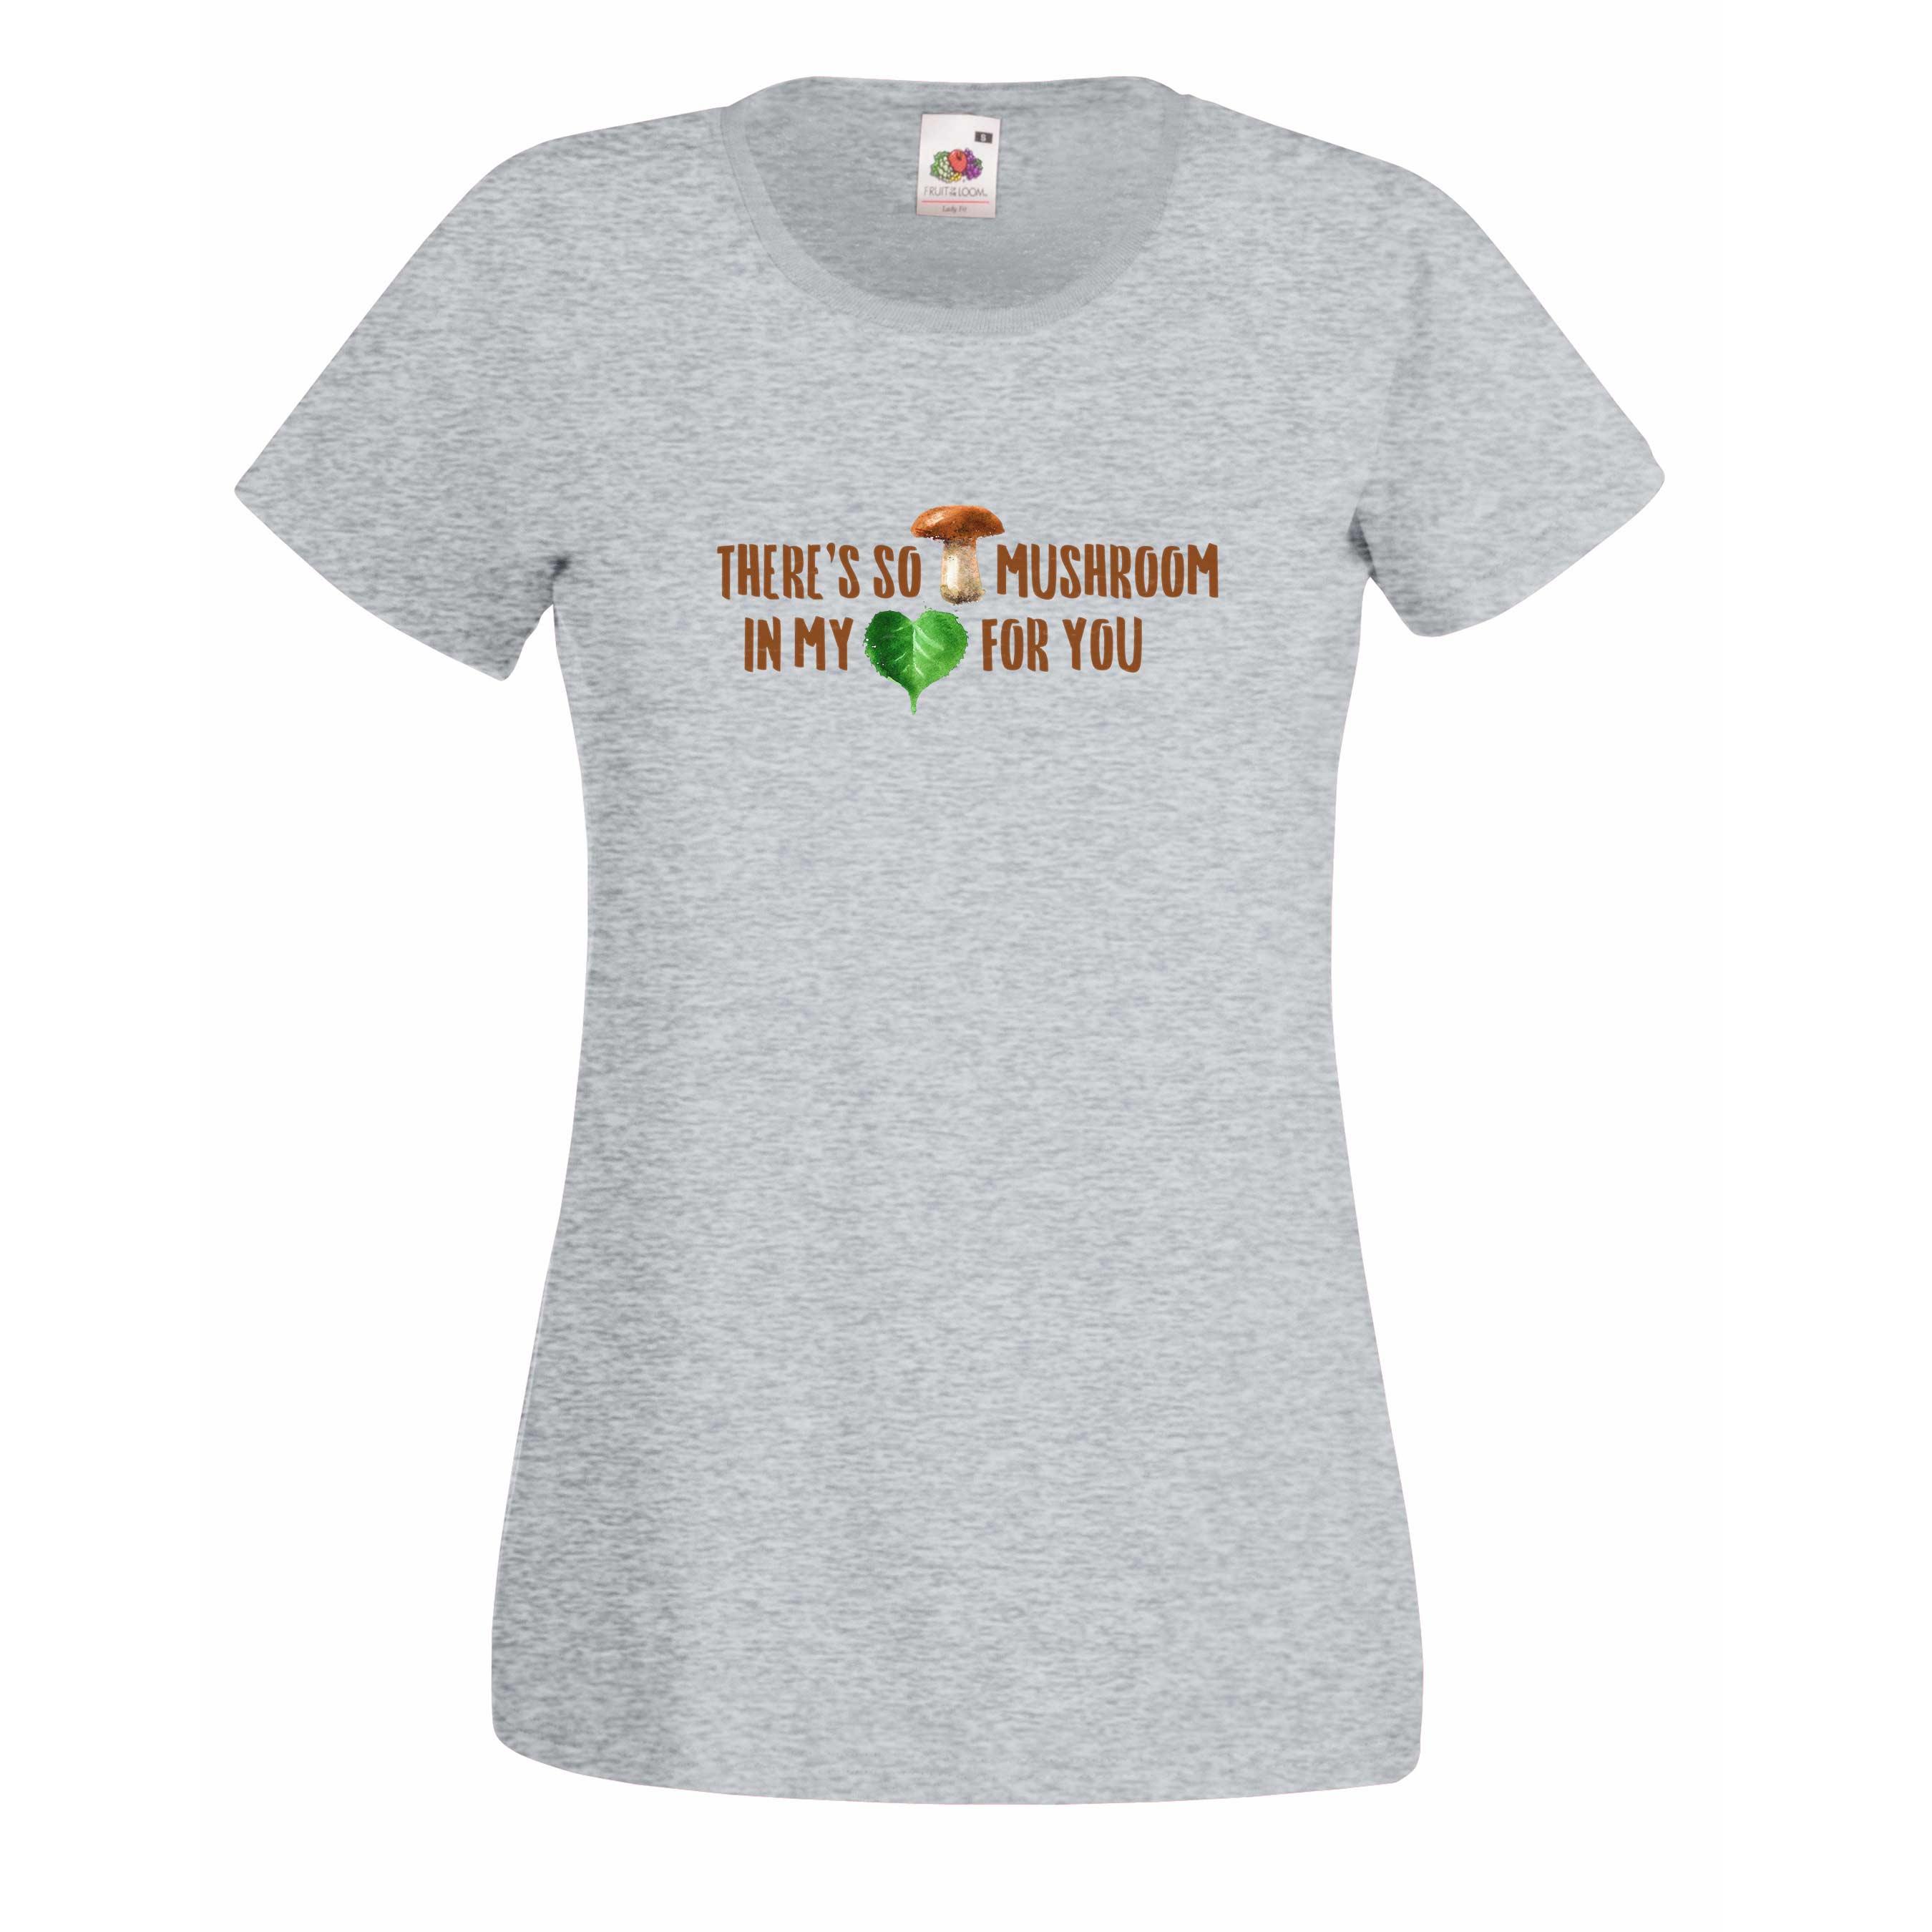 Mushroom design for t-shirt, hoodie & sweatshirt